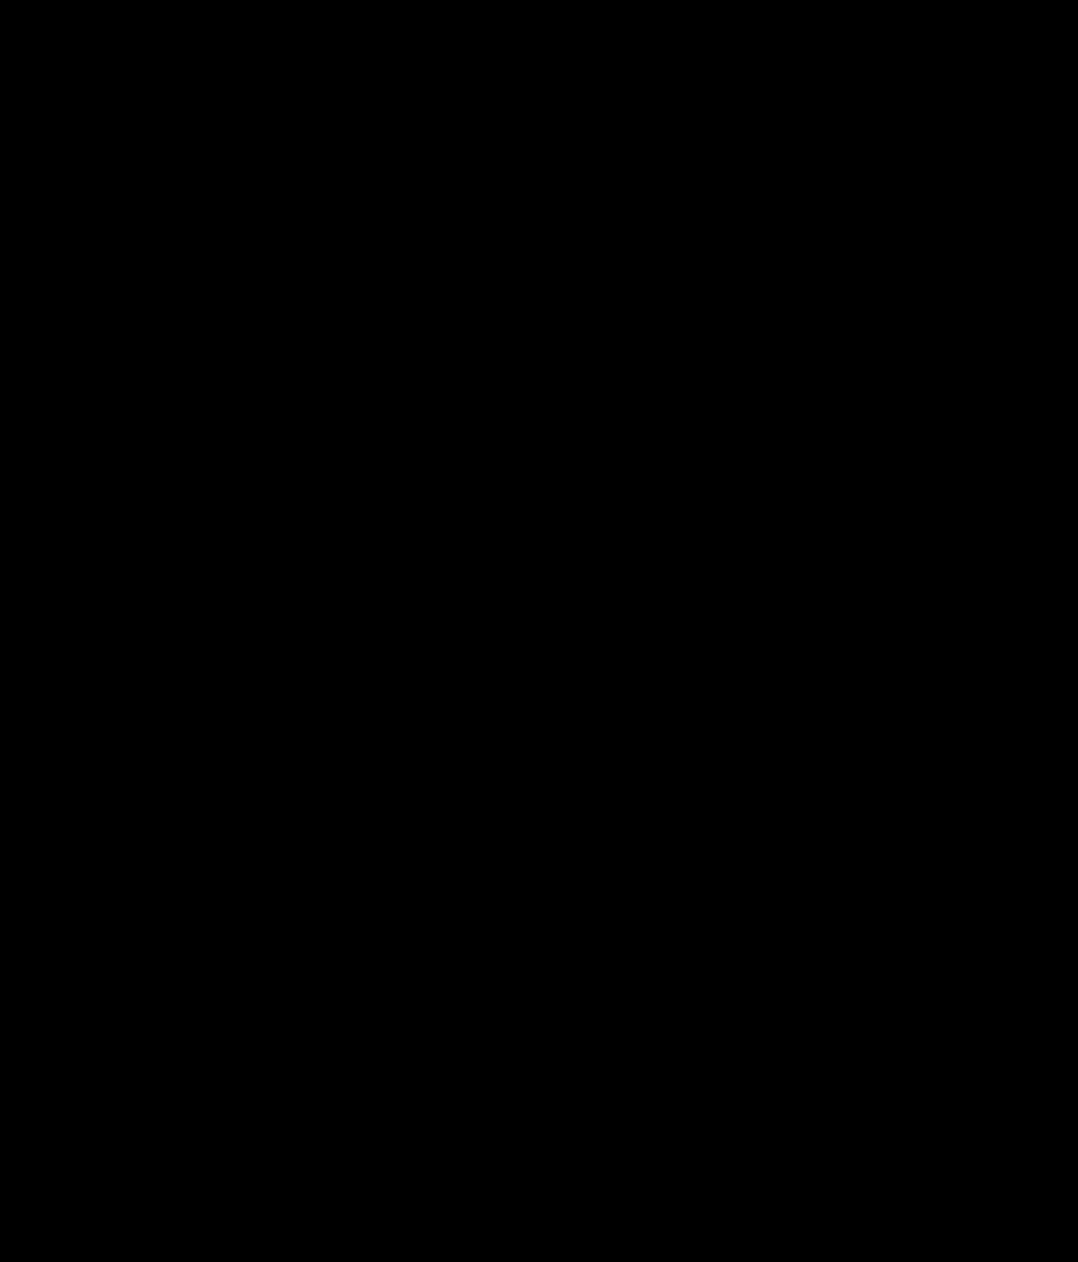 1078x1262 Clipart